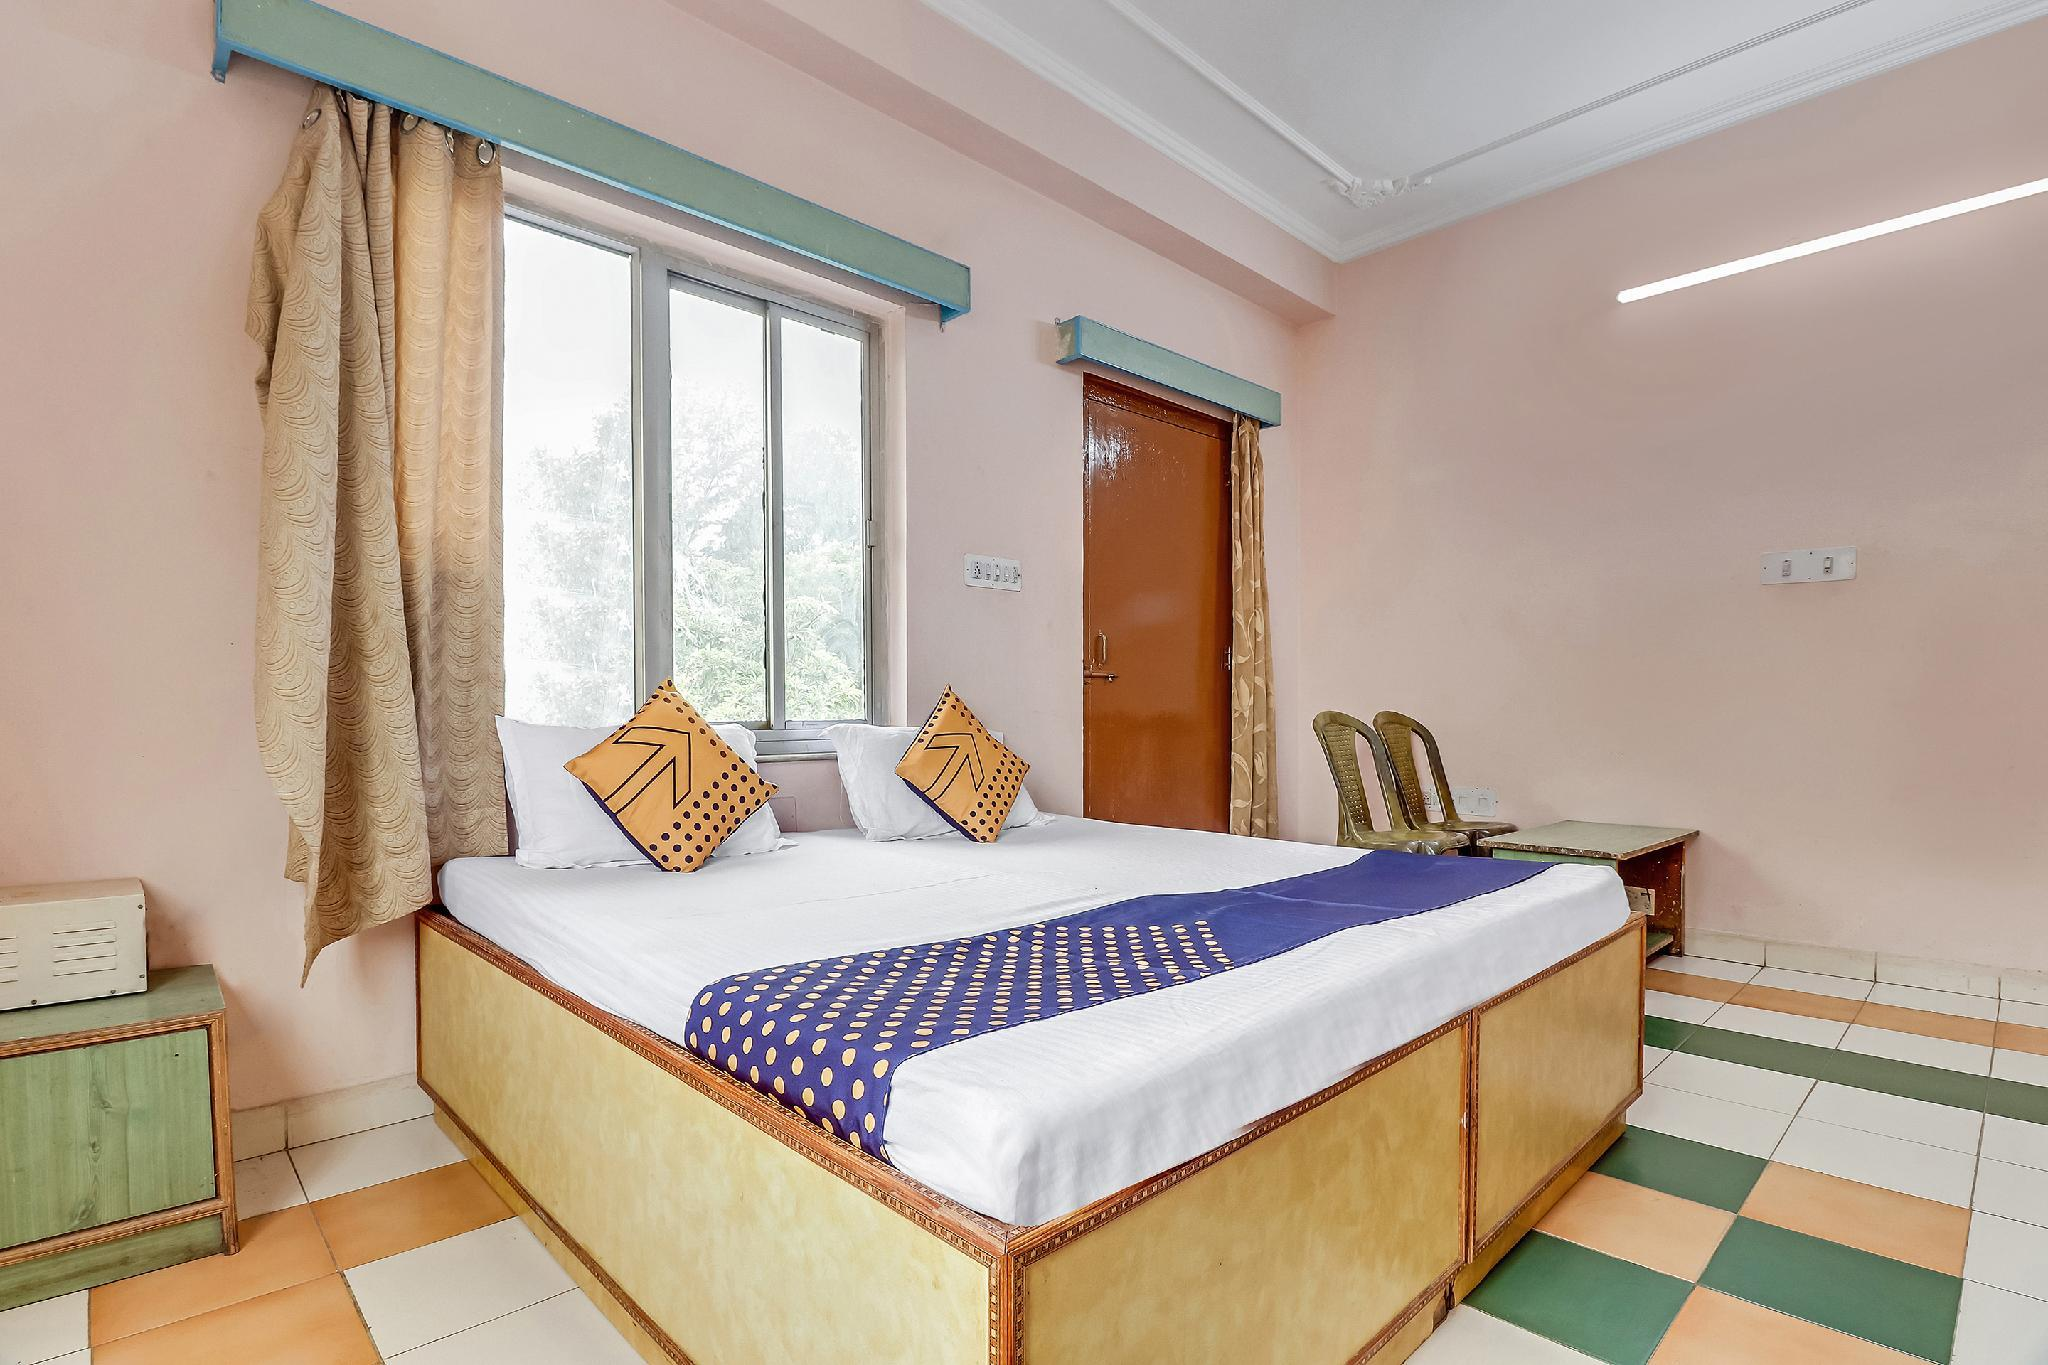 SPOT ON 64302 Jhurmut Hotel And Restaurant